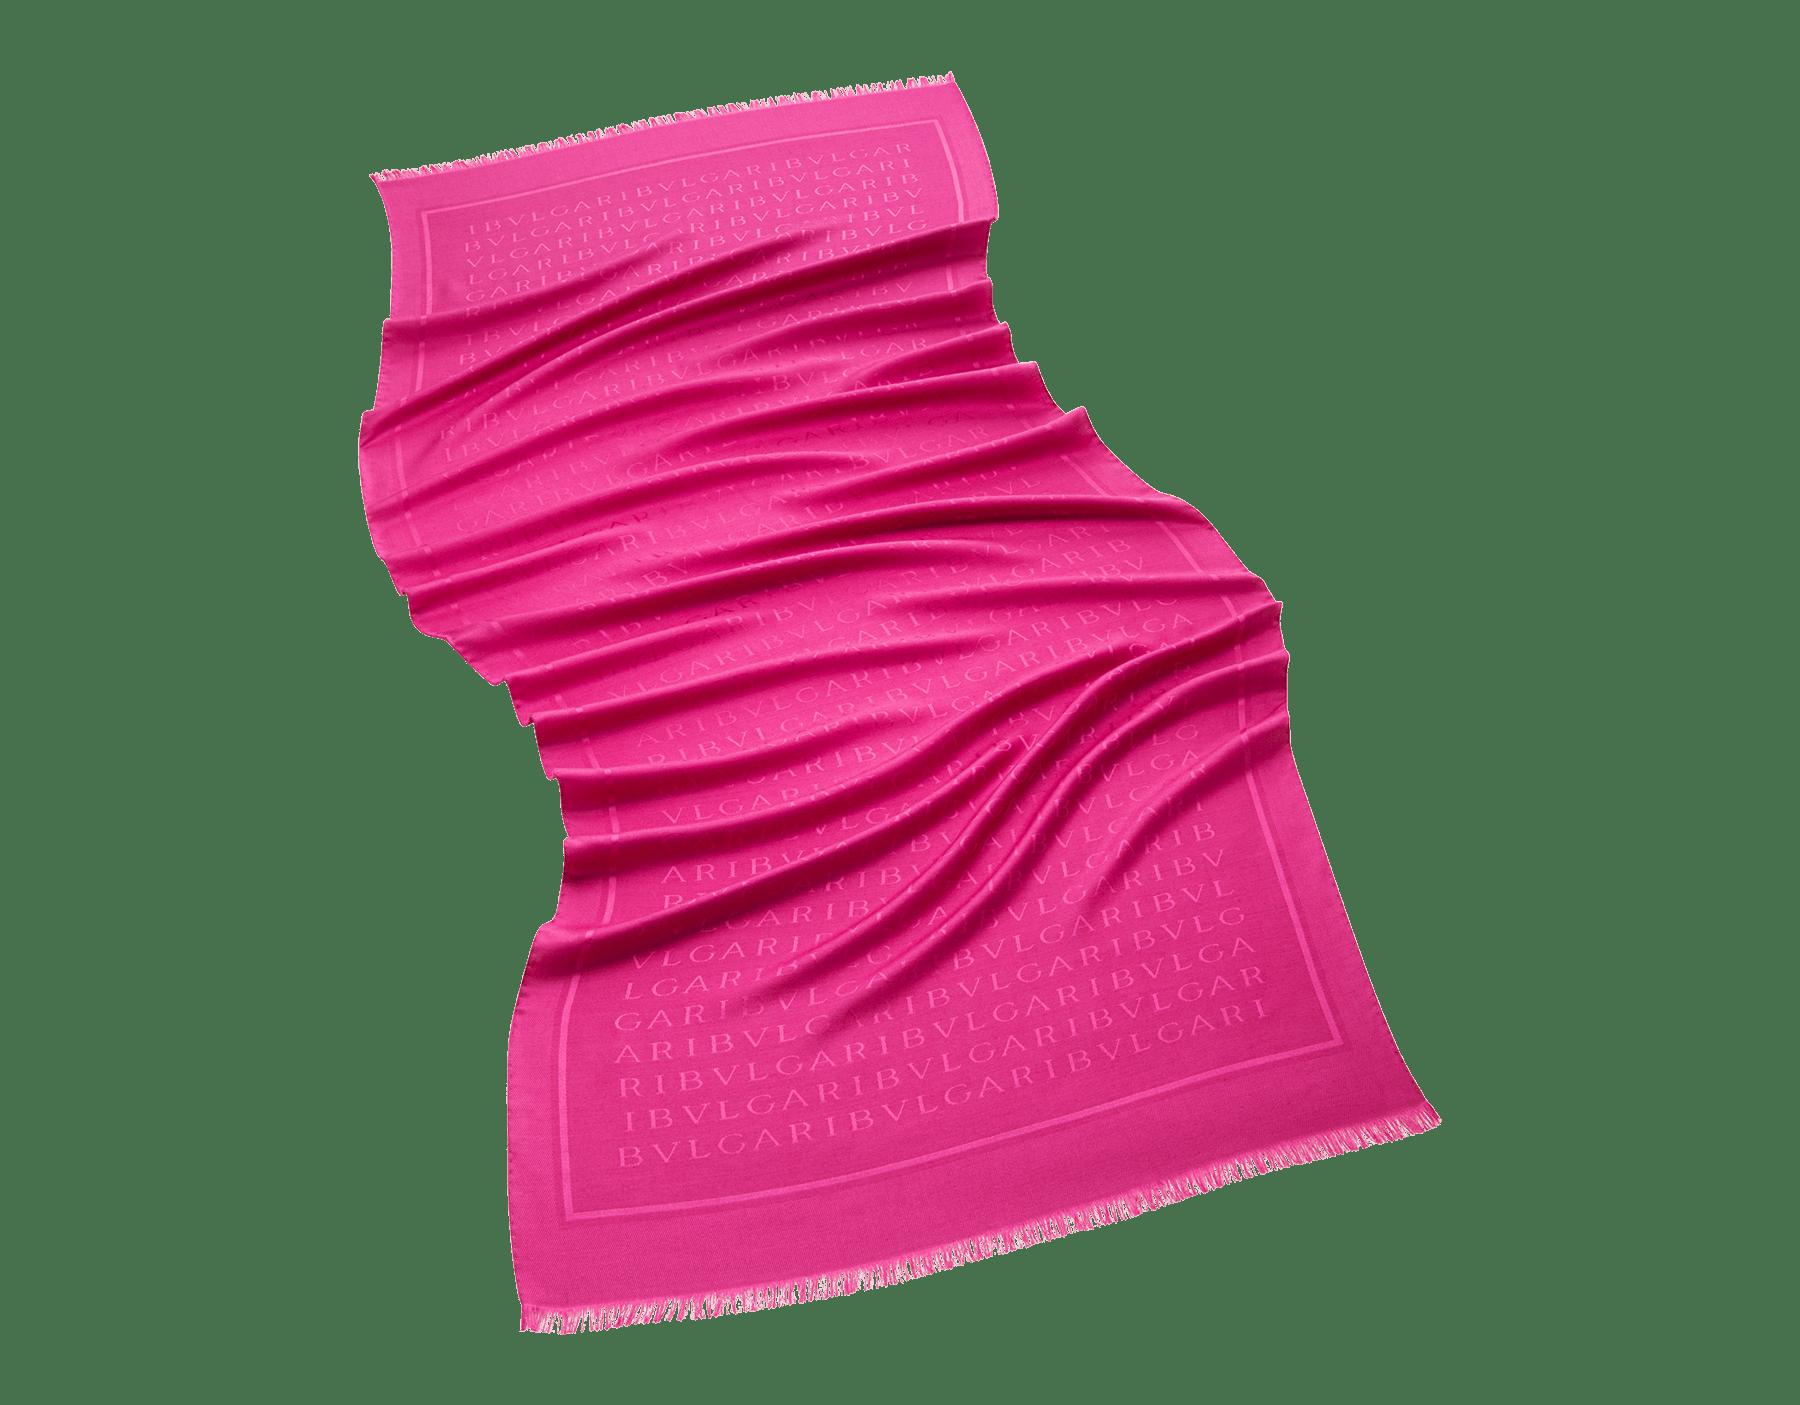 Estola Lettere Maxi de lana de seda fina color turmalina rosa. 244482 image 1